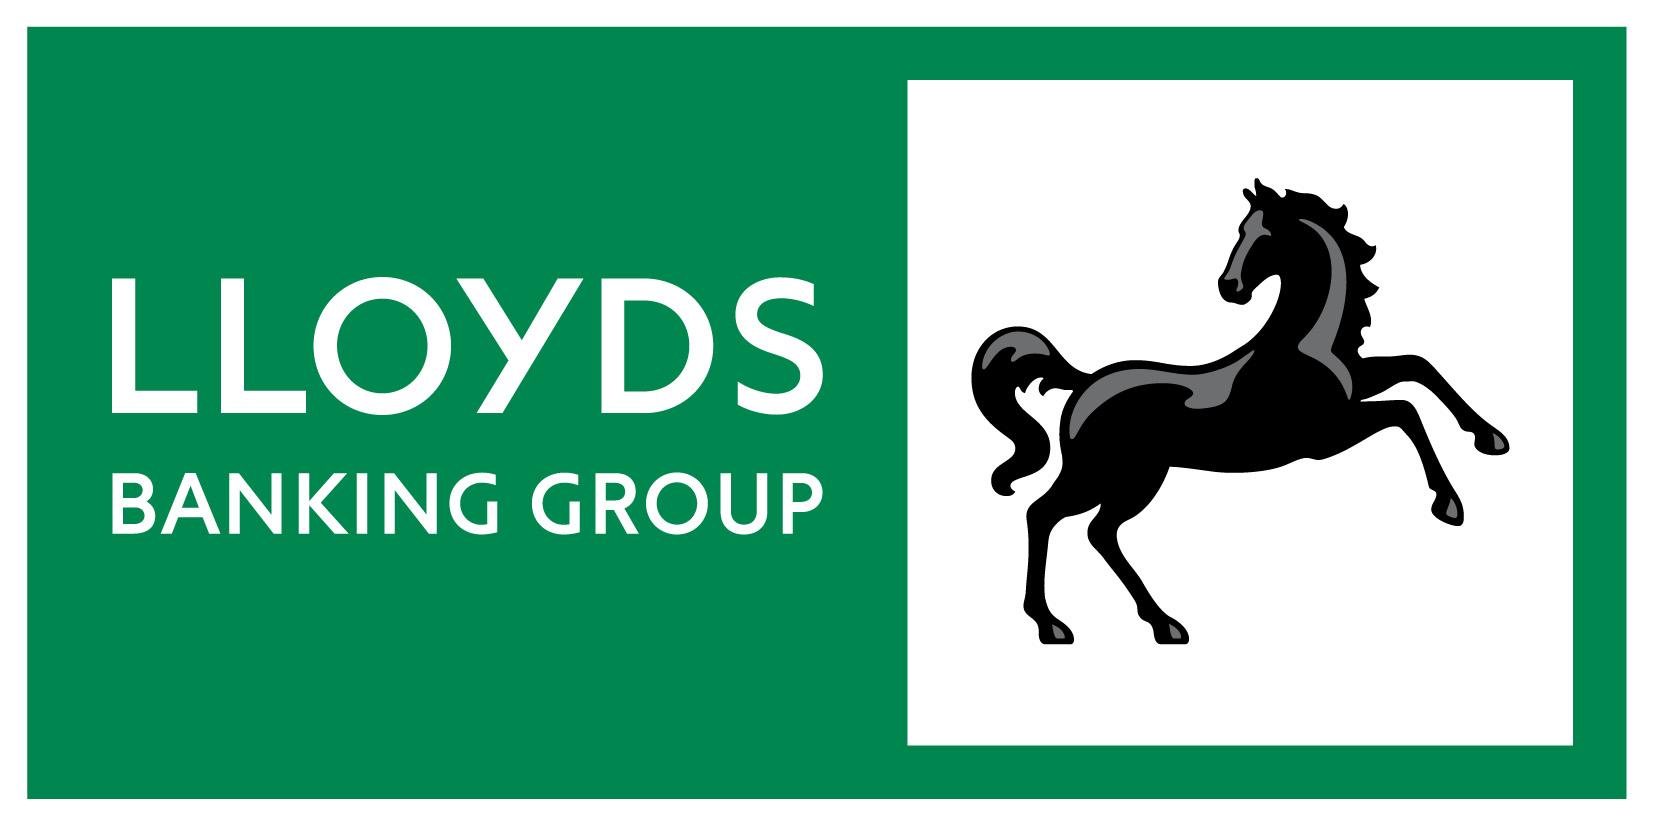 Lloyds Banking Group logo.jpg